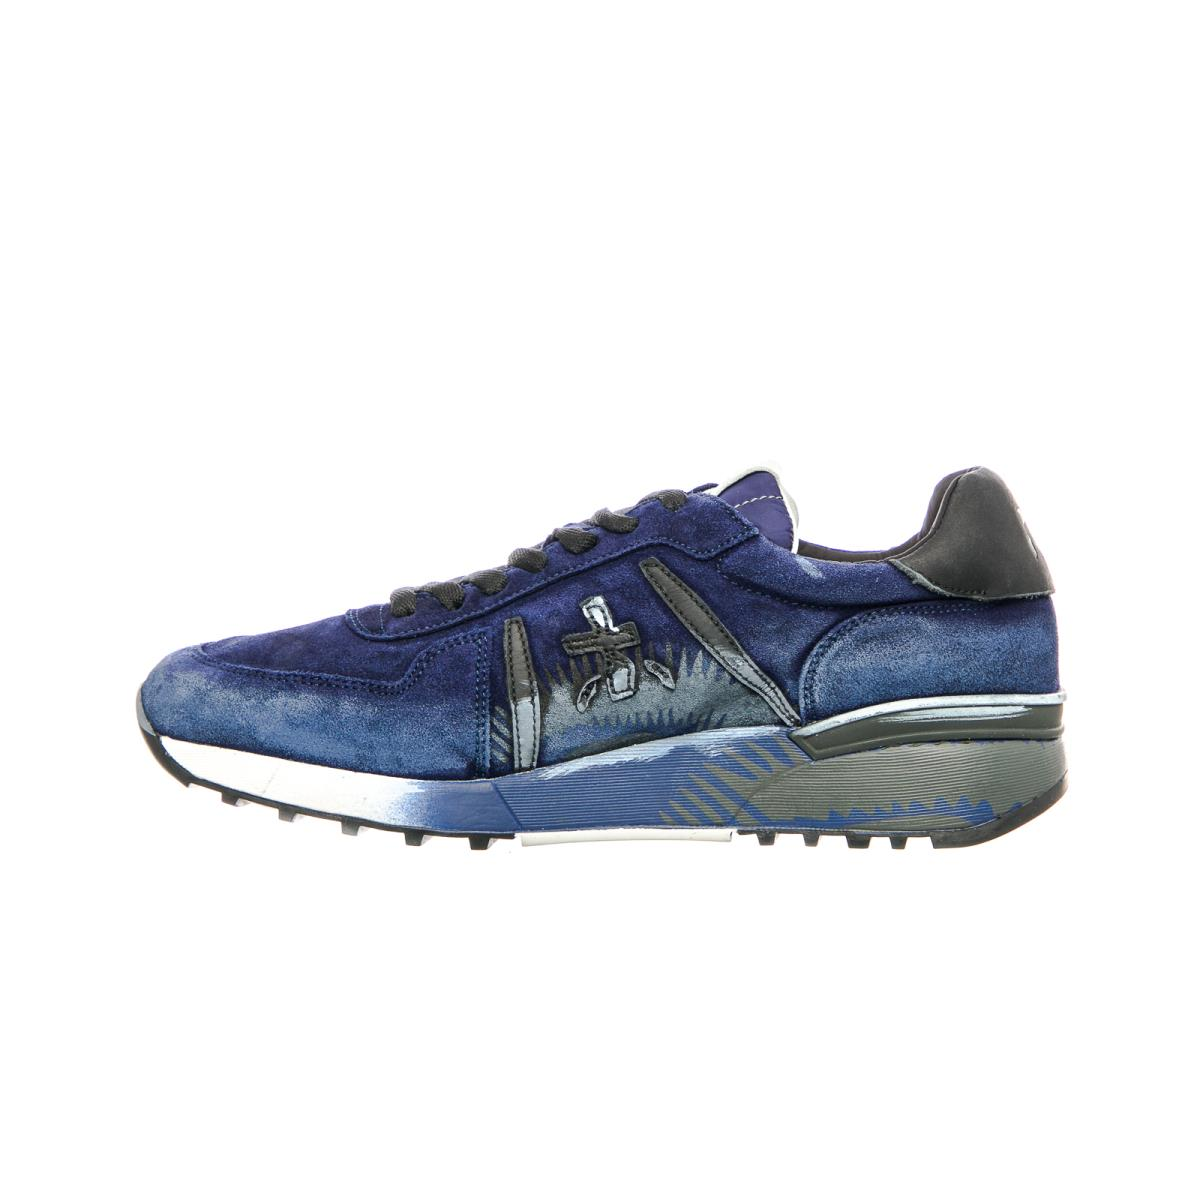 fedcc693e8b sneakers-premiata-blu-brian-3574-3.jpg